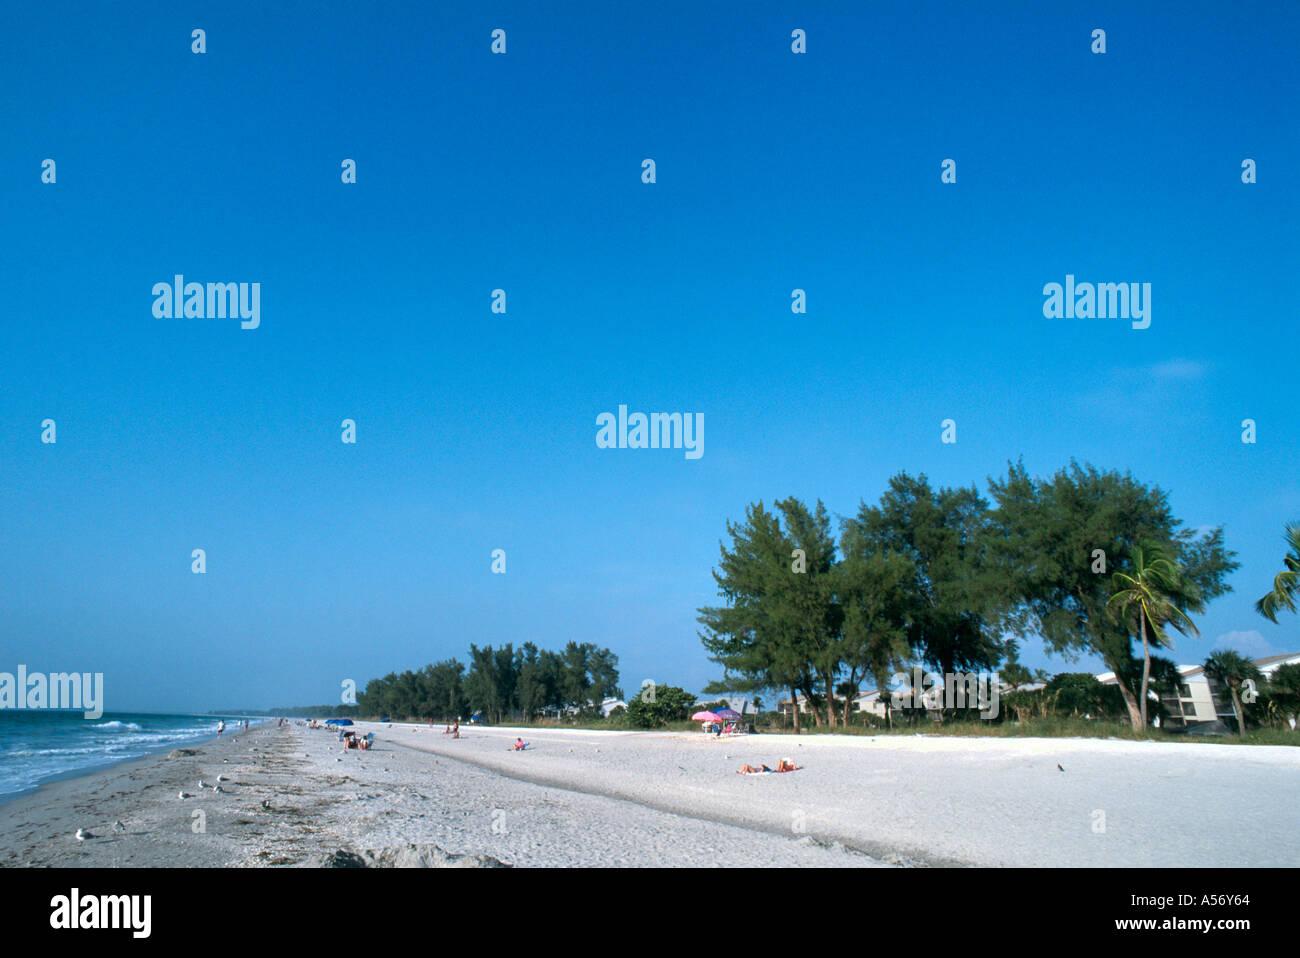 Beacb on Captiva Island, Gulf Coast, Florida, USA Stock Photo